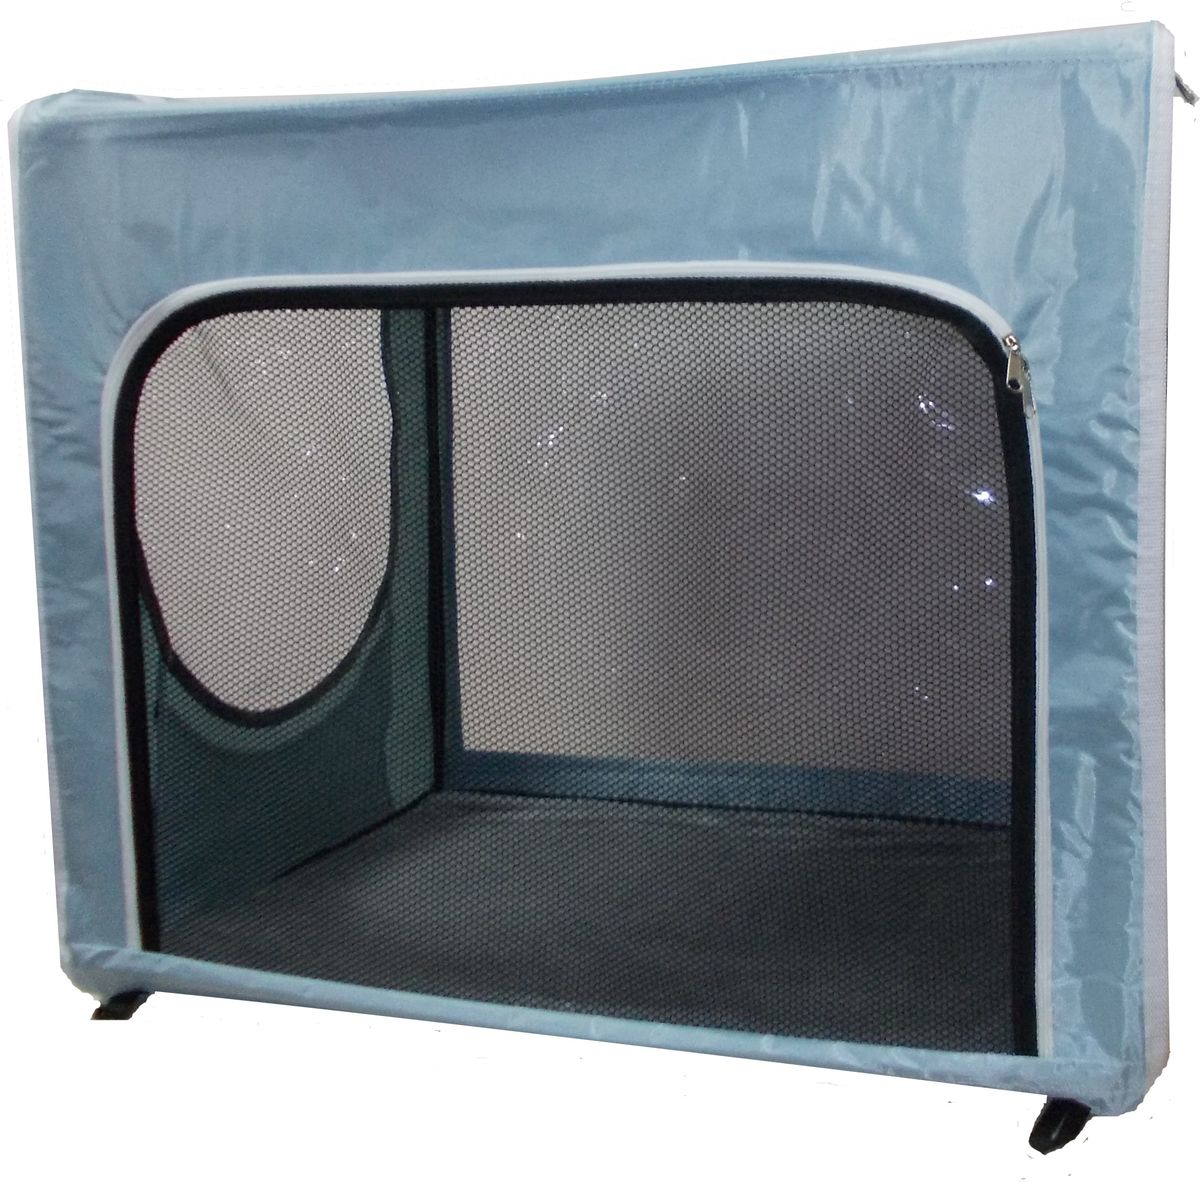 Клетка для животных  Заря-Плюс , выставочная, цвет: голубой, 75 х 60 х 50 см. КТВ2/1